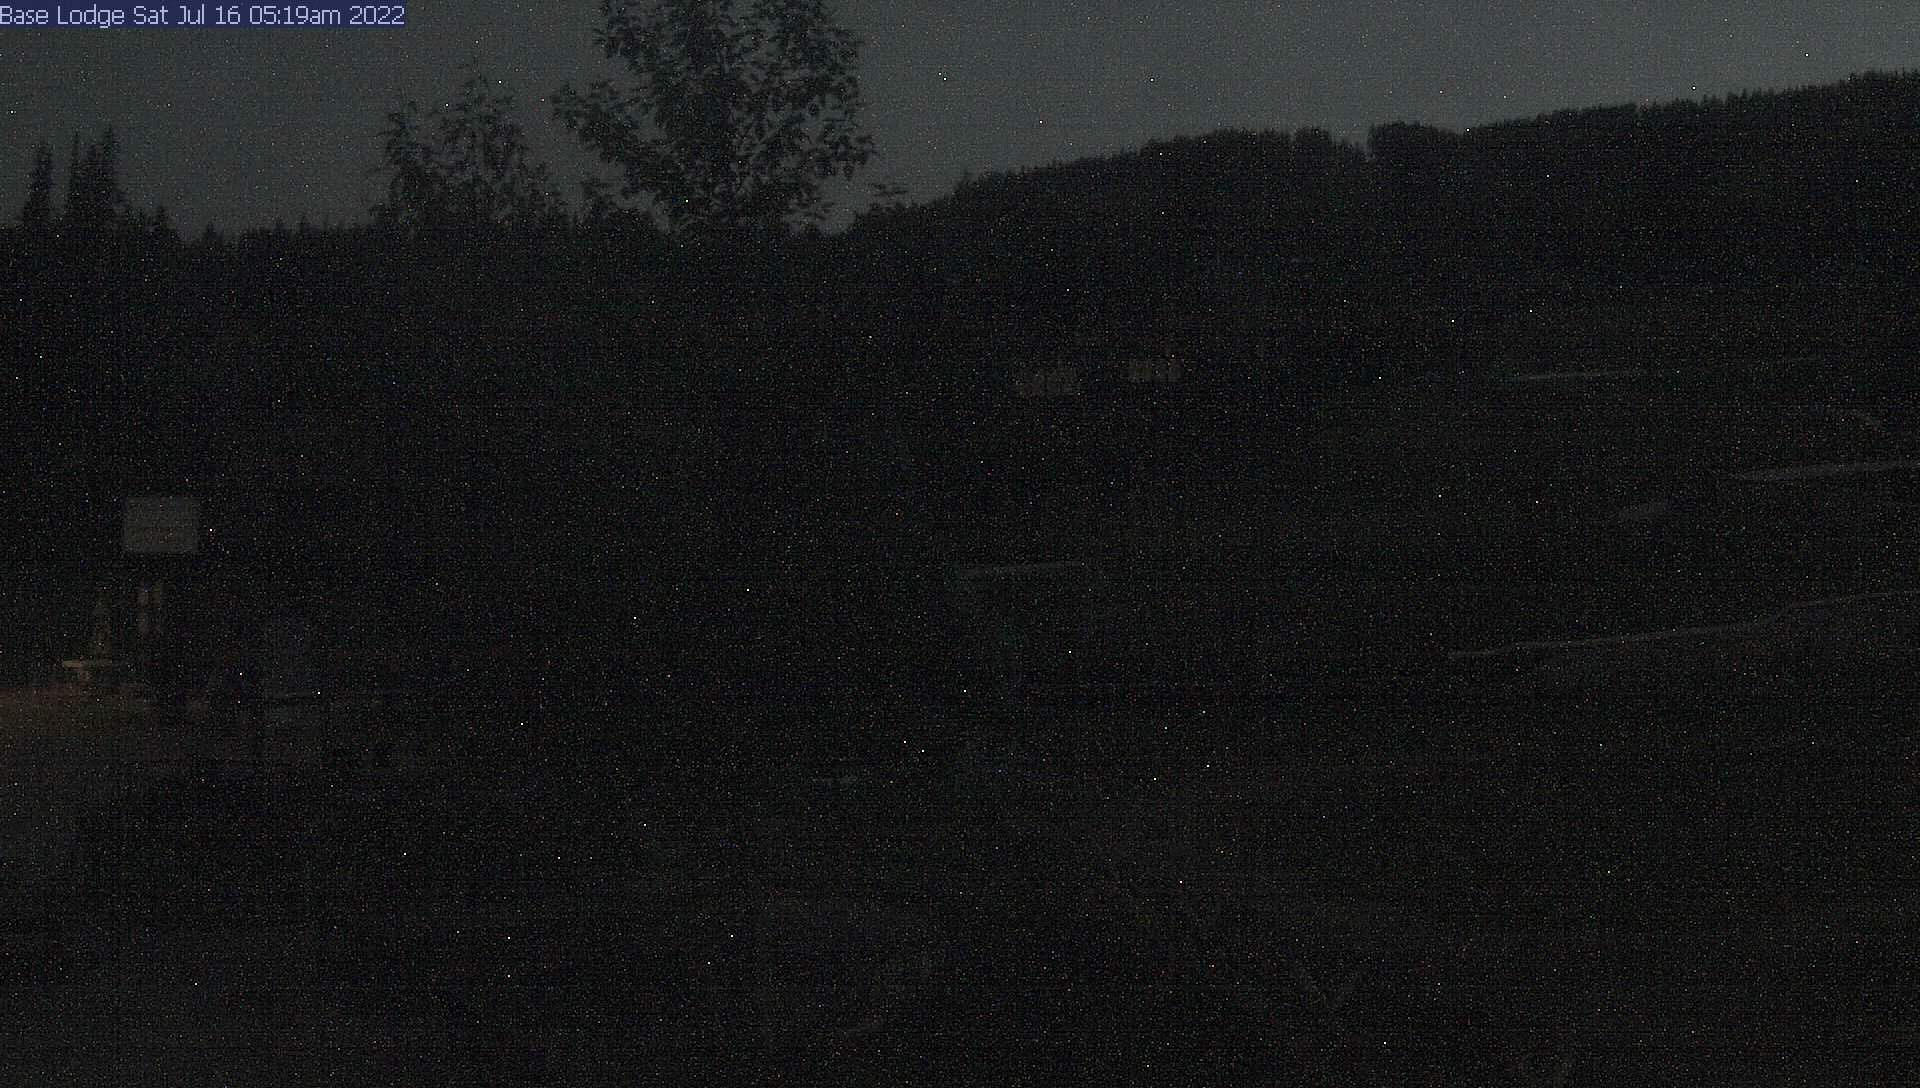 Ski Resort Base Lodge